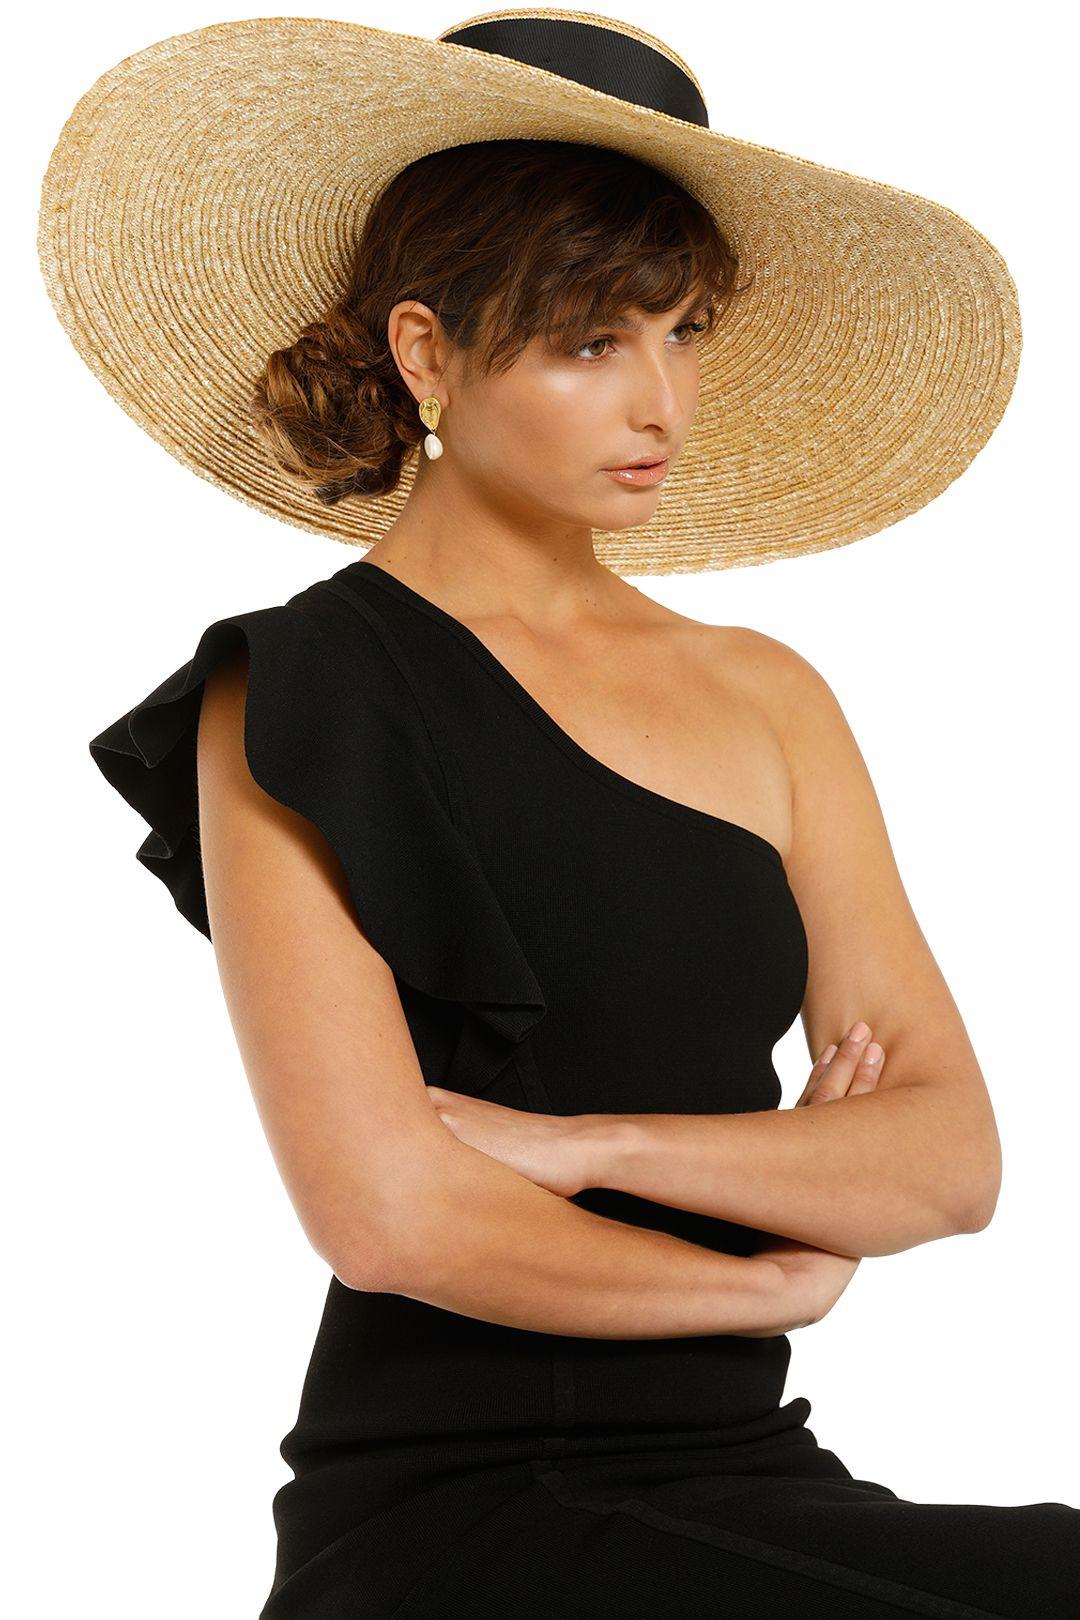 Heather-McDowall-Daniella-Oversized-Hat-Black-Product-One